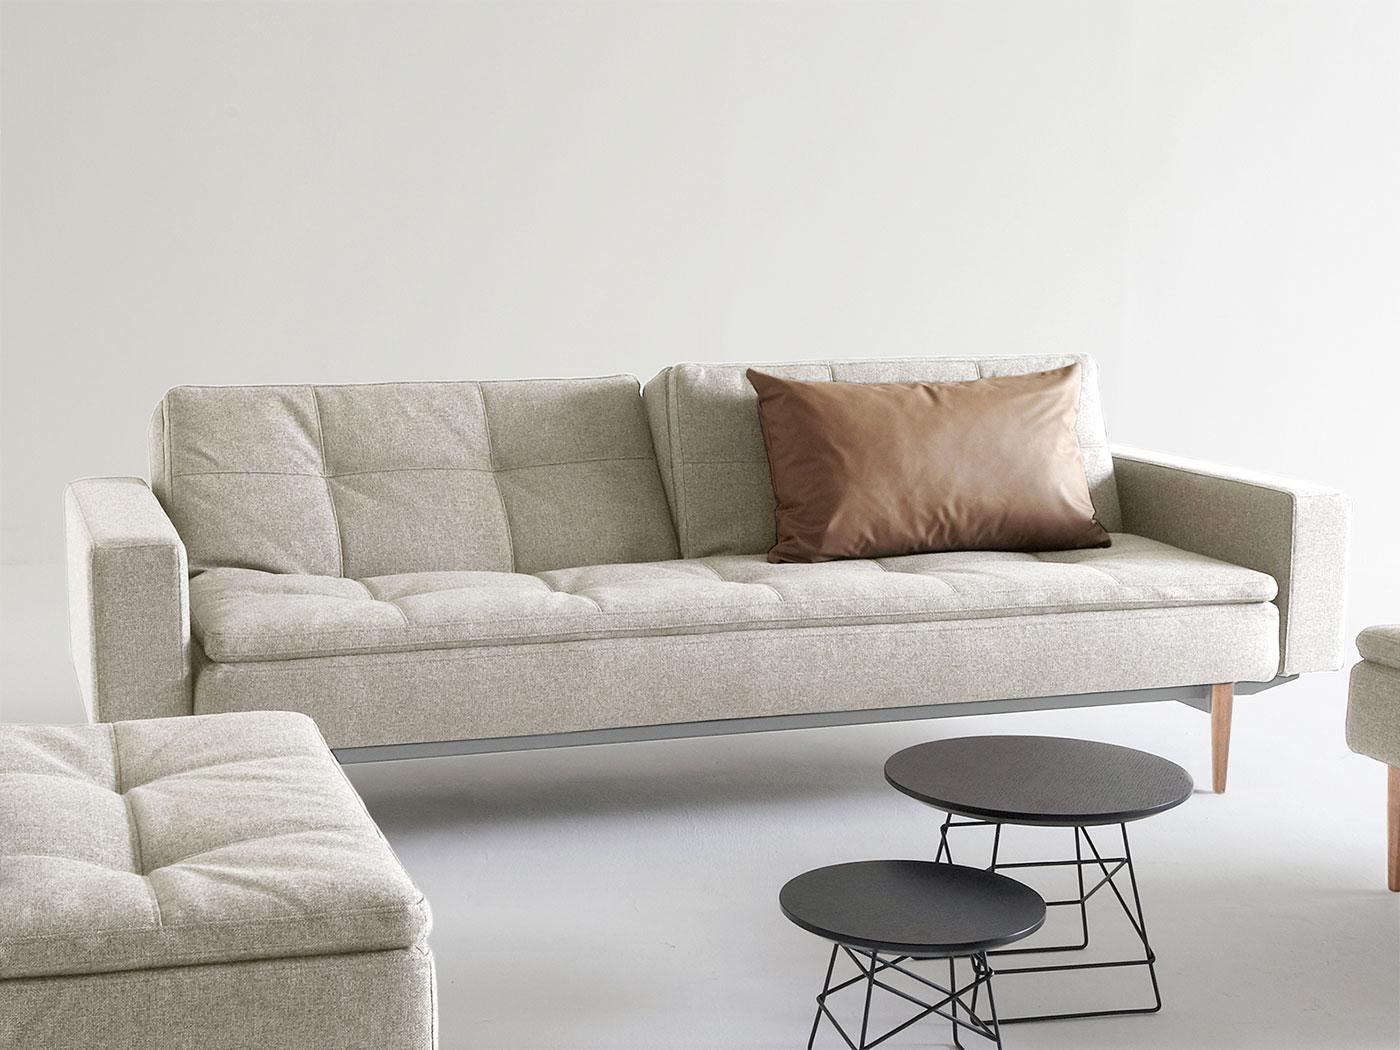 schlafsofa mit lehne amazing gallery sofa ohne lehne sehr. Black Bedroom Furniture Sets. Home Design Ideas